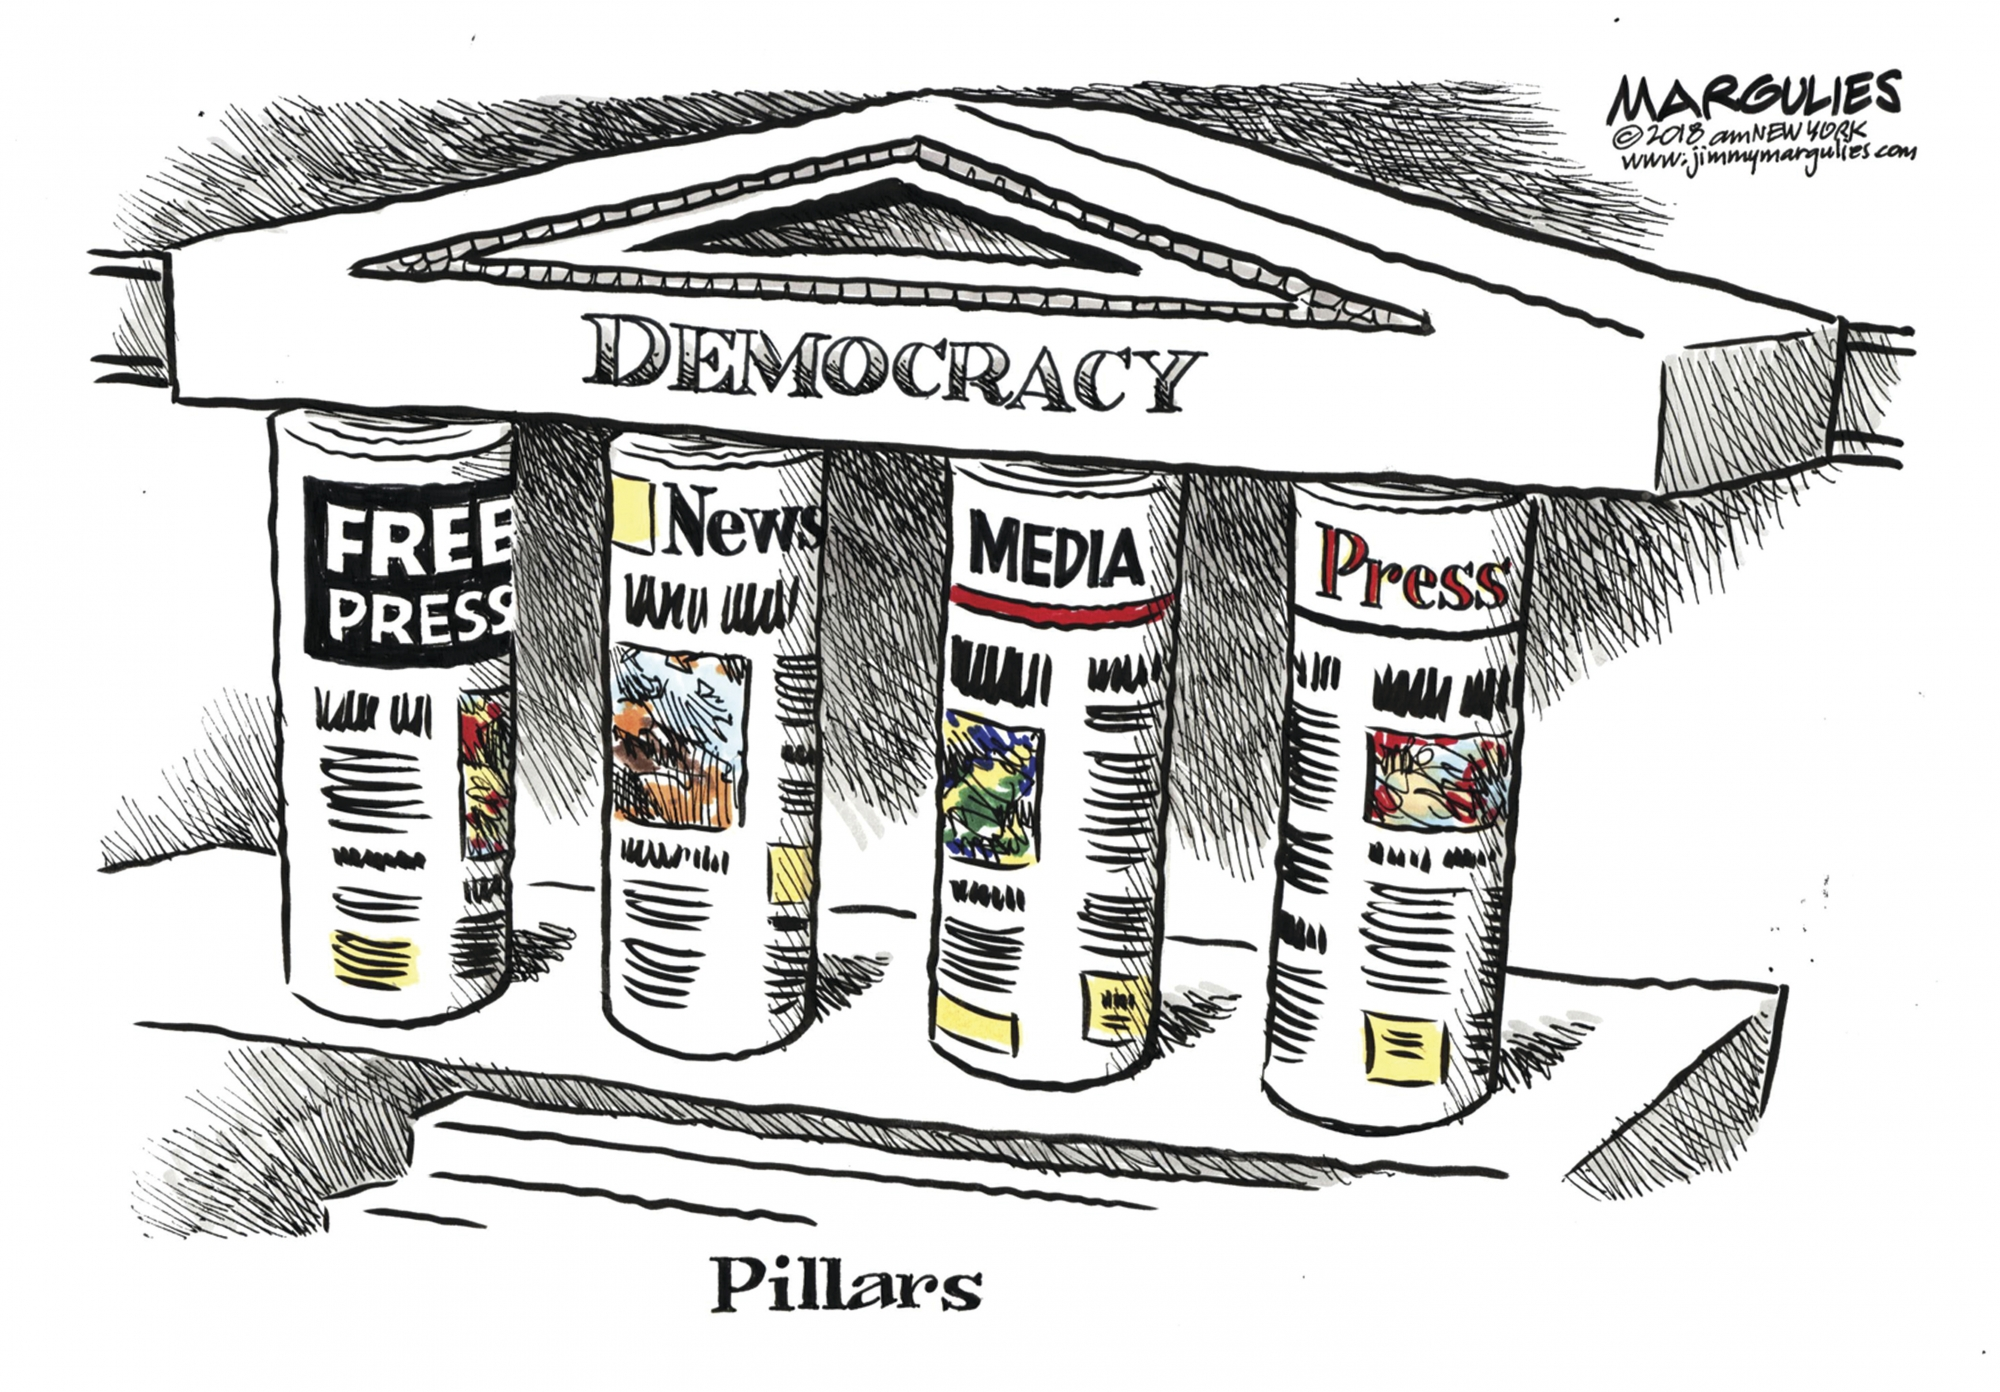 Exhibit Highlights Cartoonists Focus On First Amendment